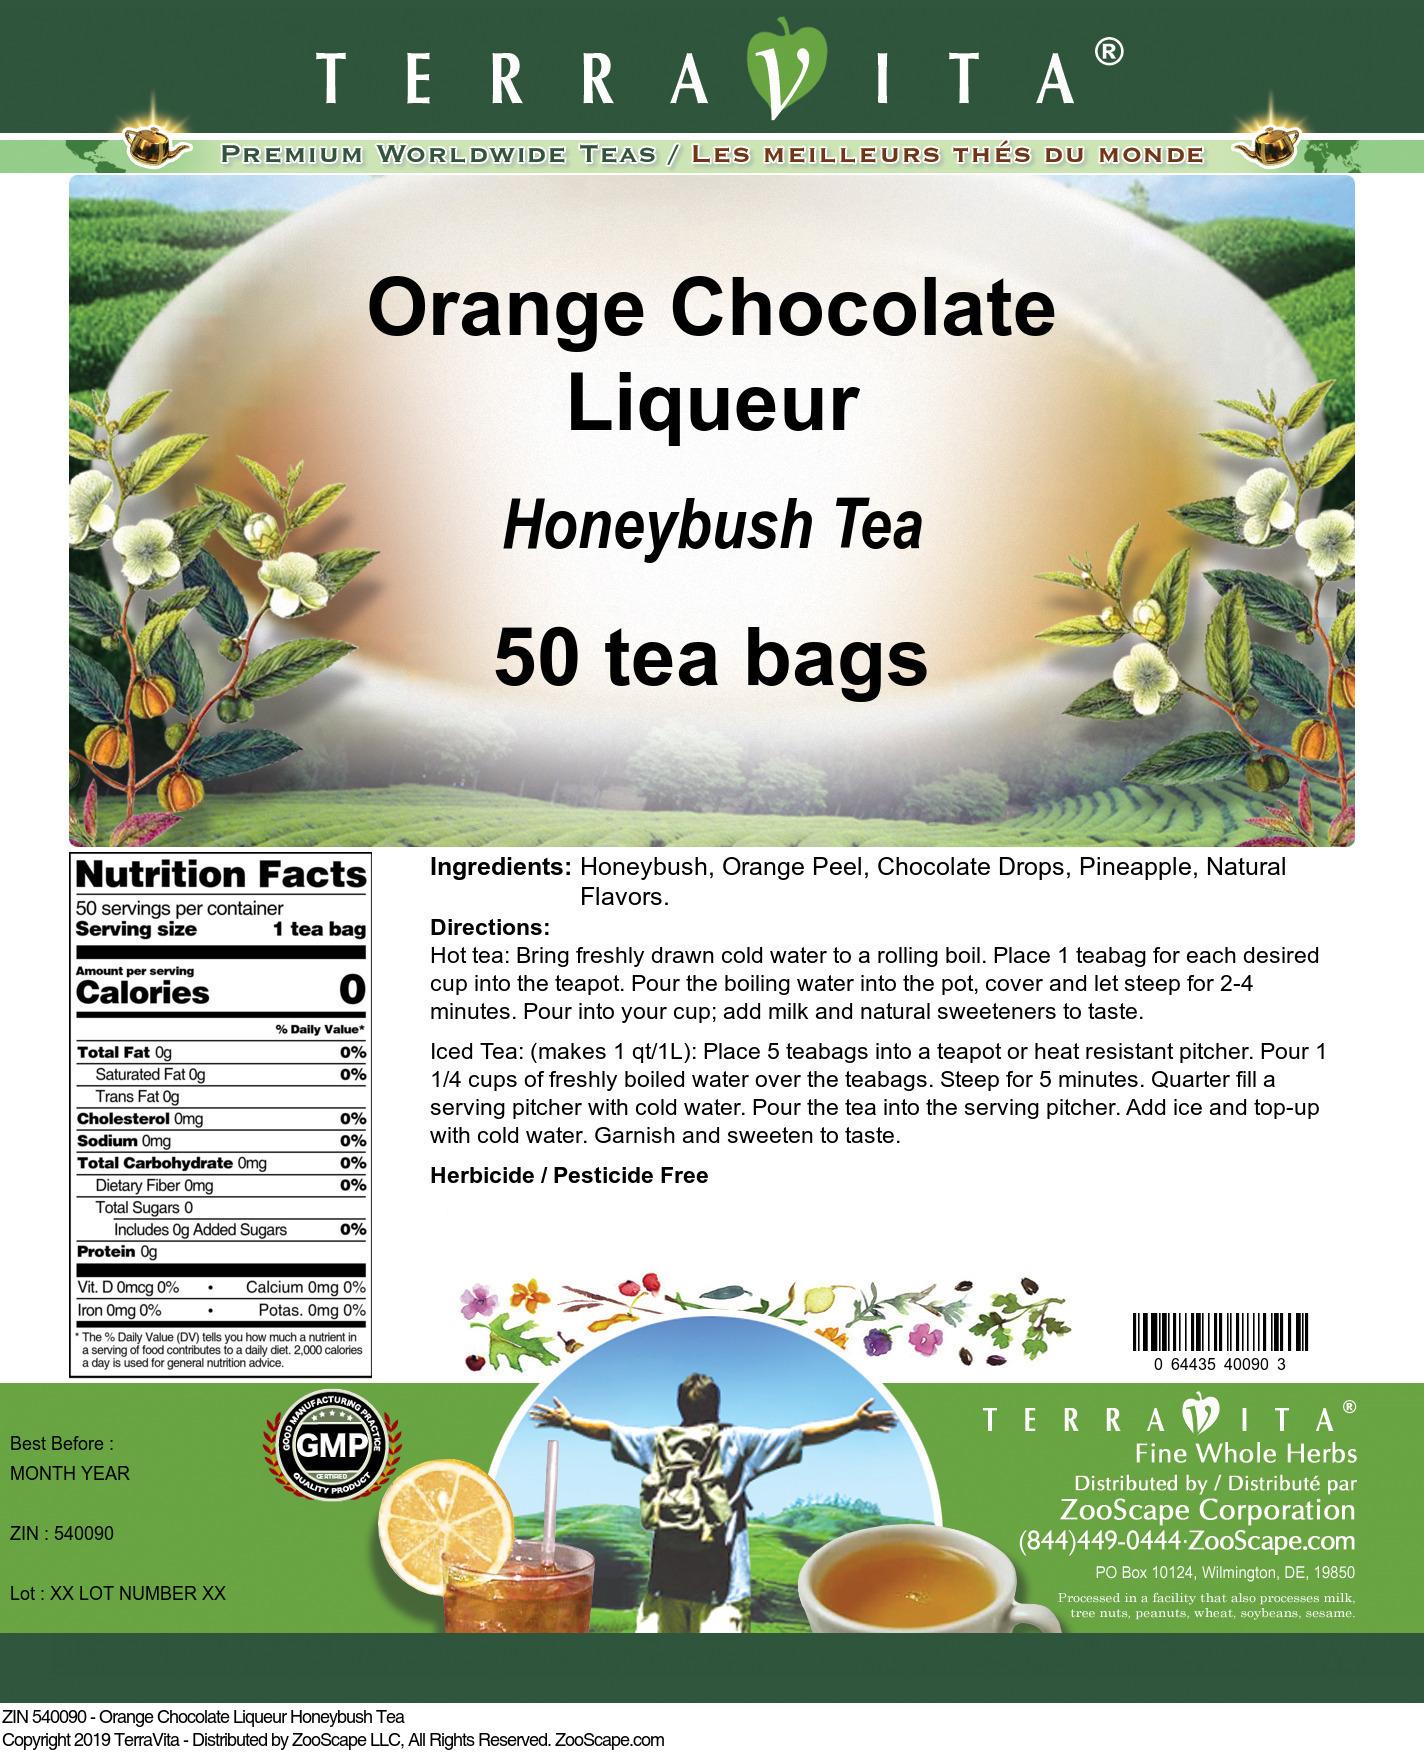 Orange Chocolate Liqueur Honeybush Tea